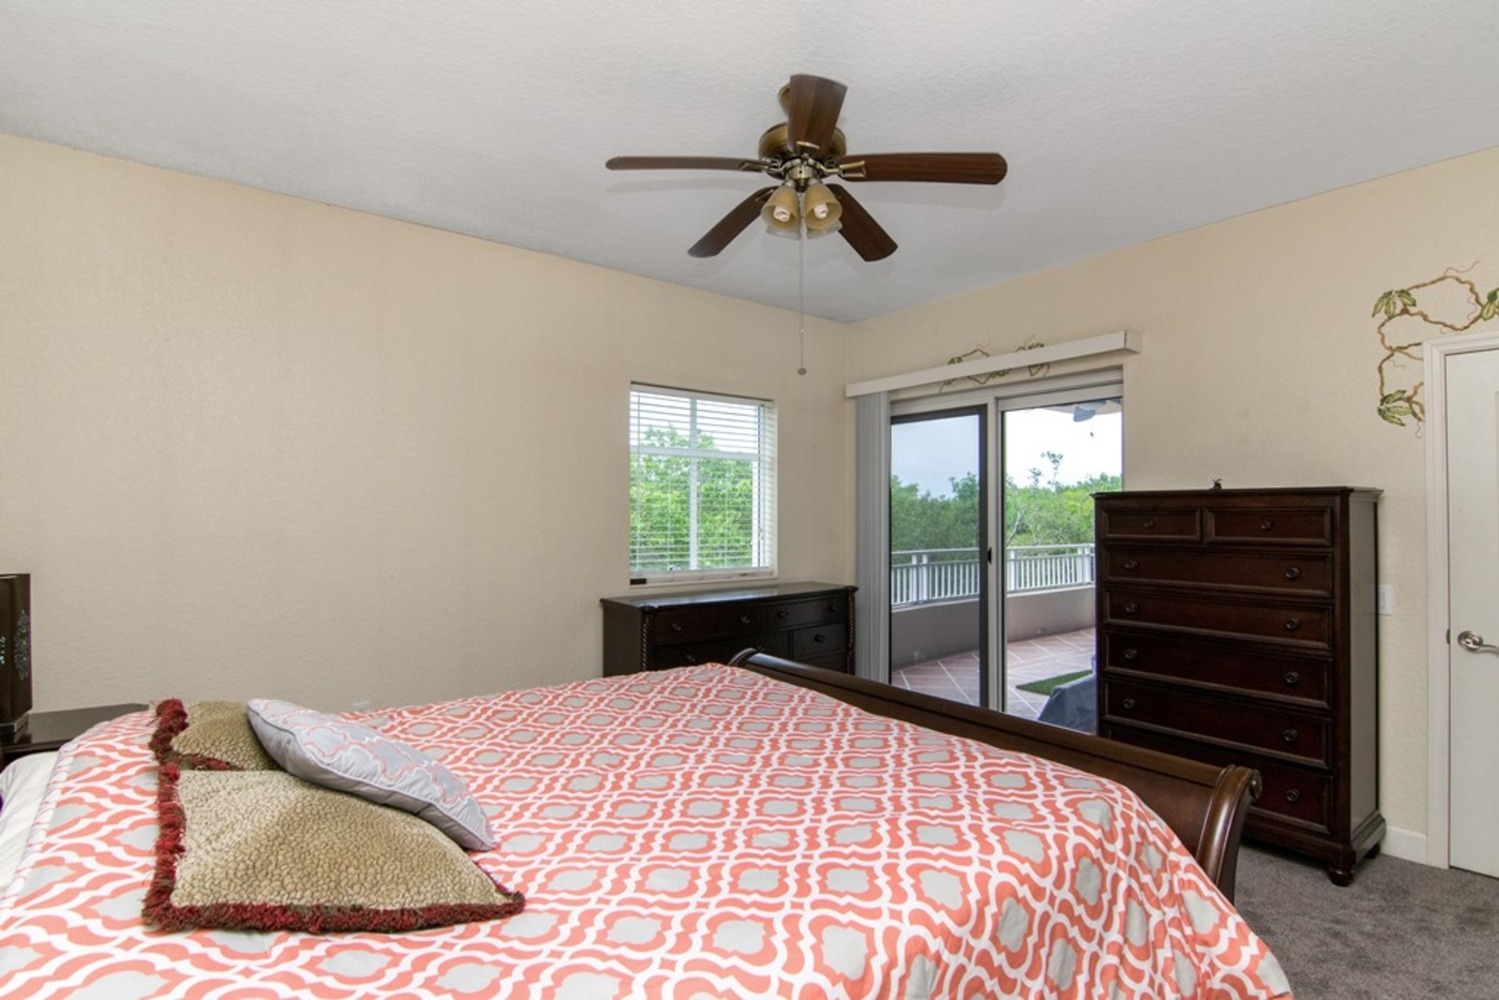 25 master bedroom